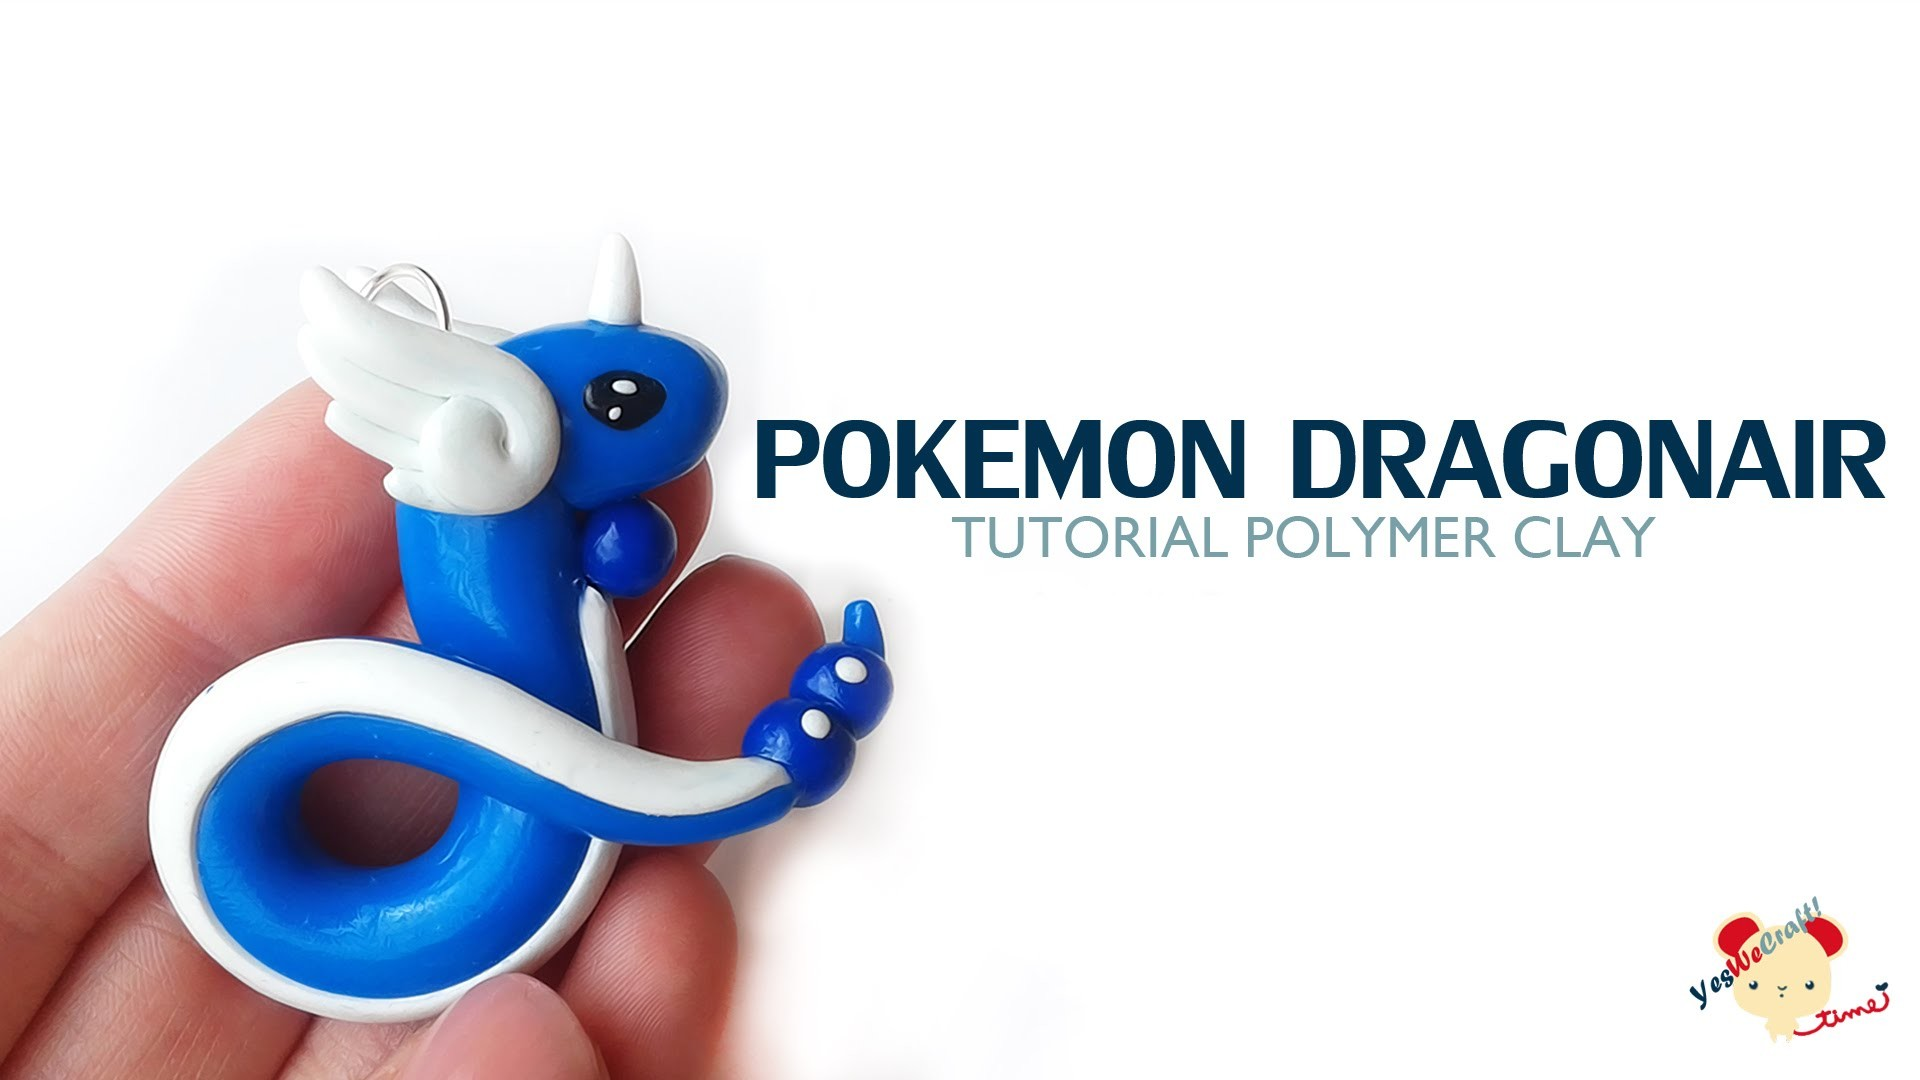 Dragonair Polymer Clay Tutorial. Dragonair Arcilla Polimérica